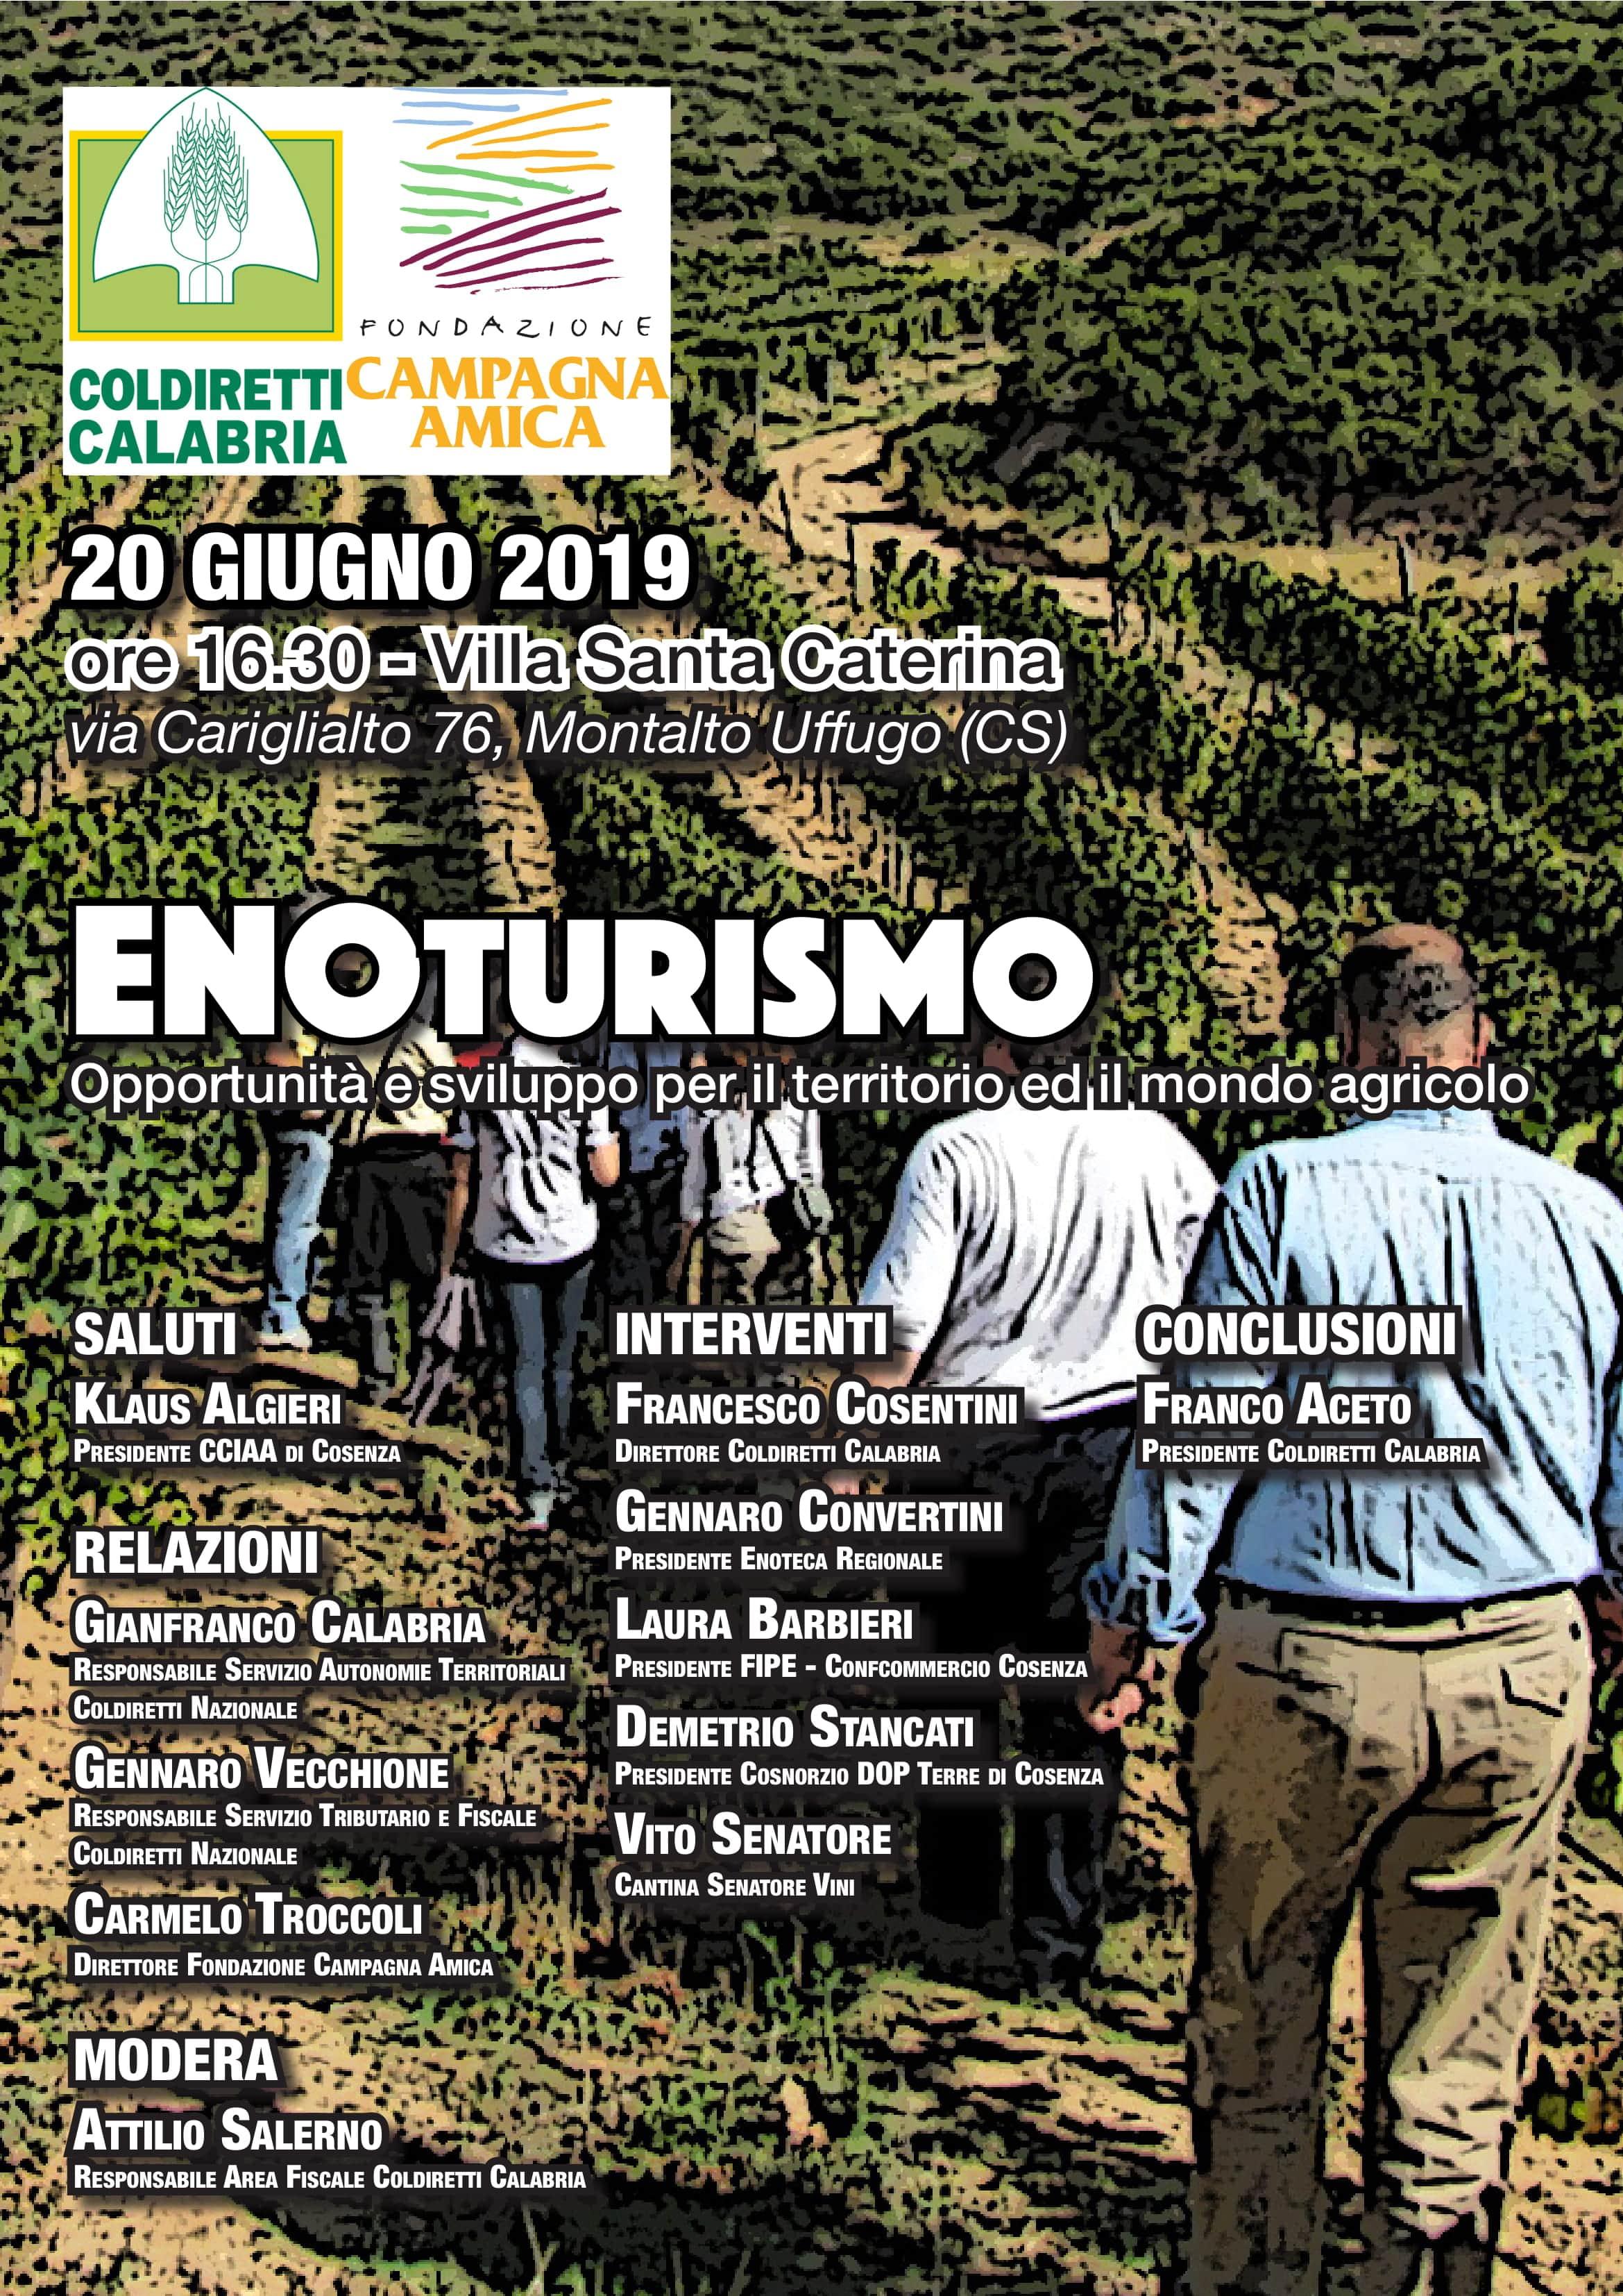 seminario a Montalto Uffugo sull'enoturismo-LameziaTermeit